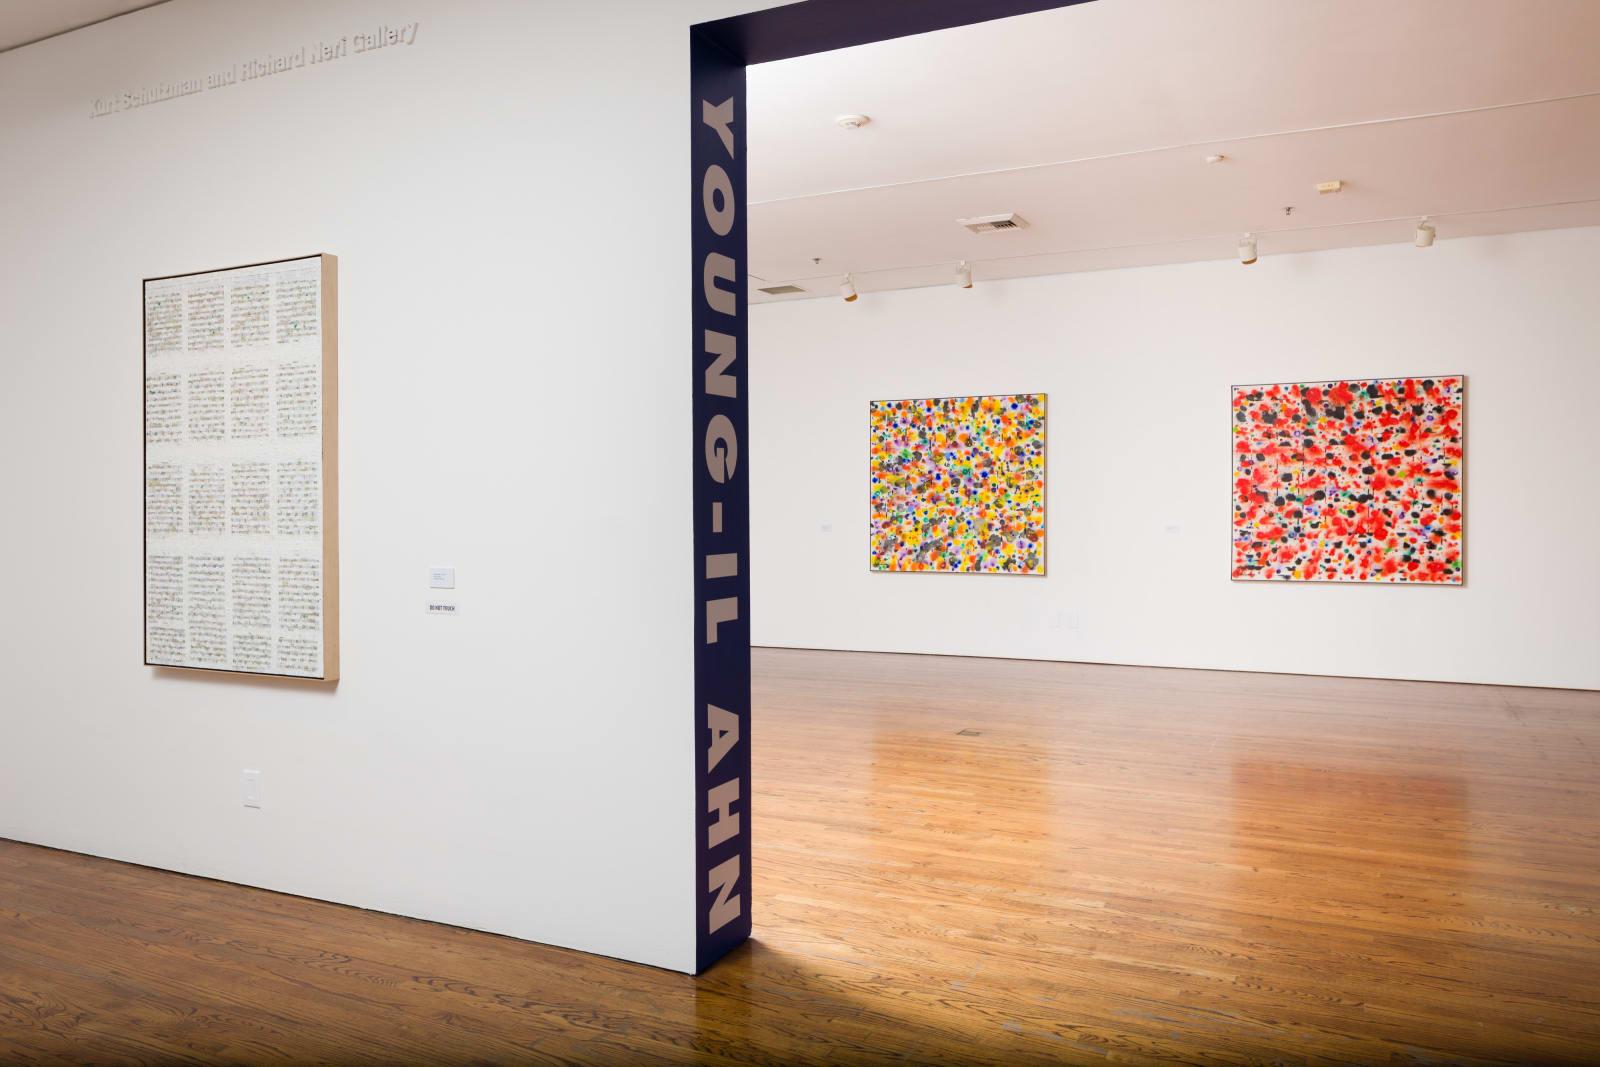 Young-Il Ahn: When Sky Meets Water, at Long Beach Museum of Art, Long Beach, California